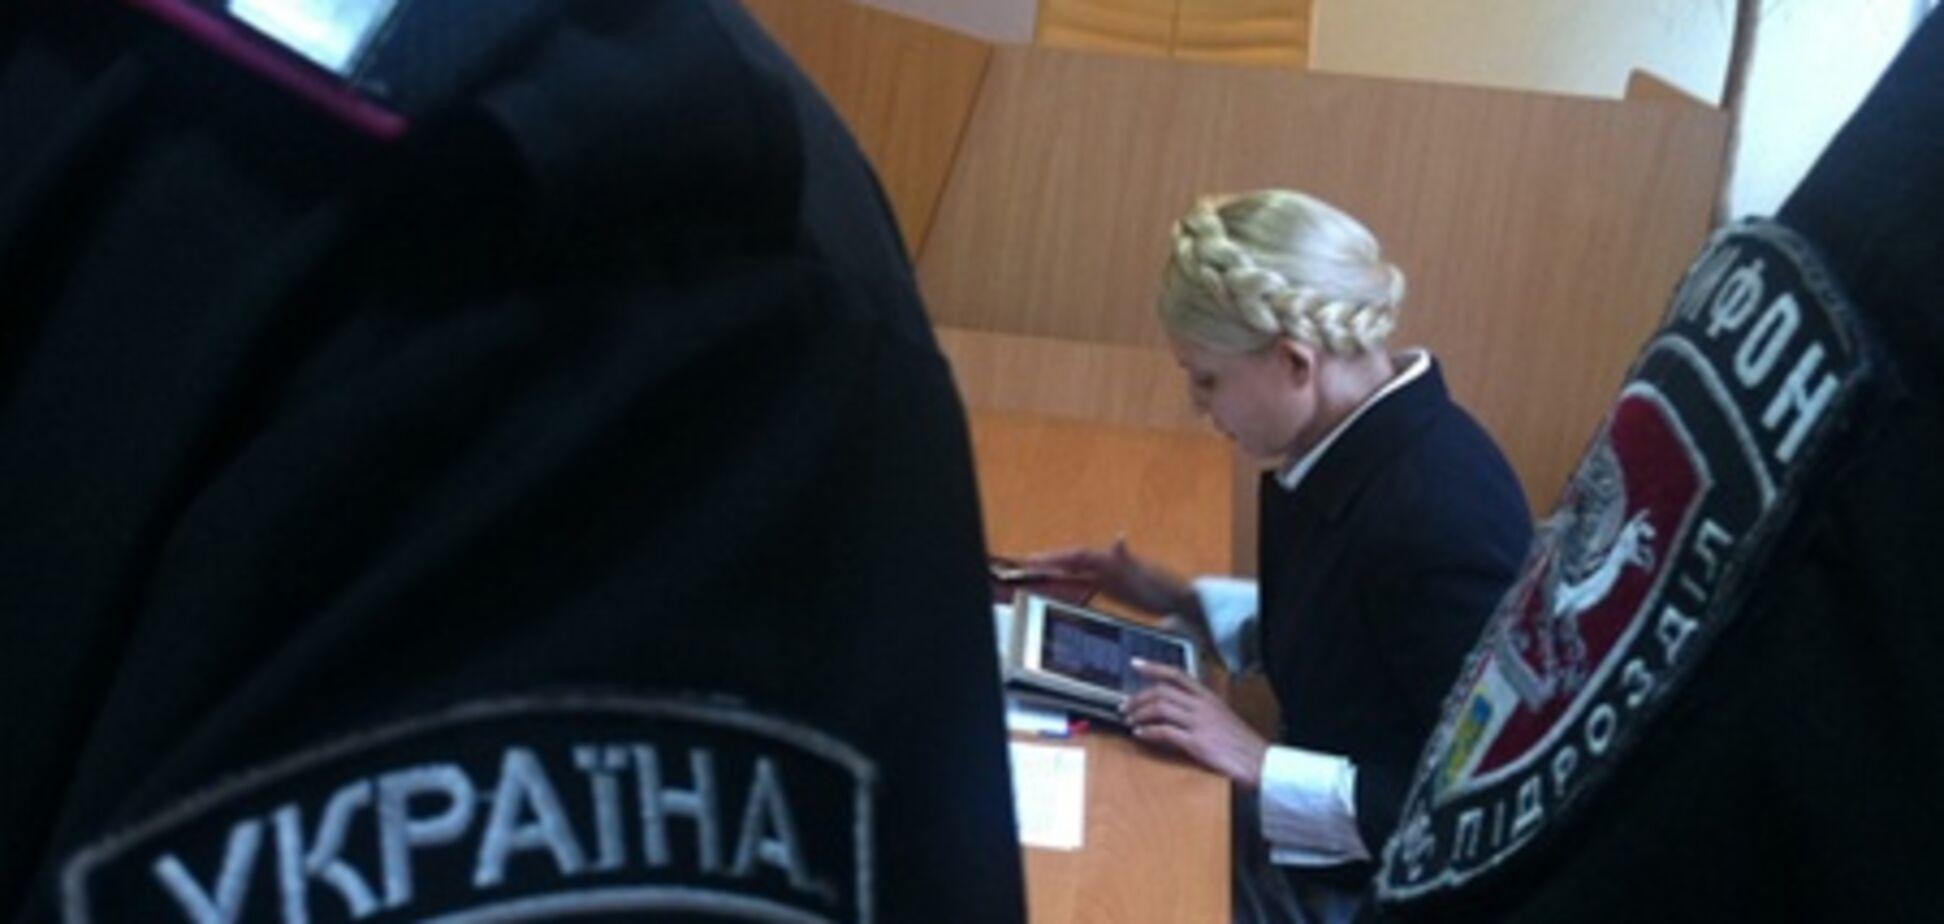 Суд против Тимошенко: кого на самом деле оправдали свидетели?